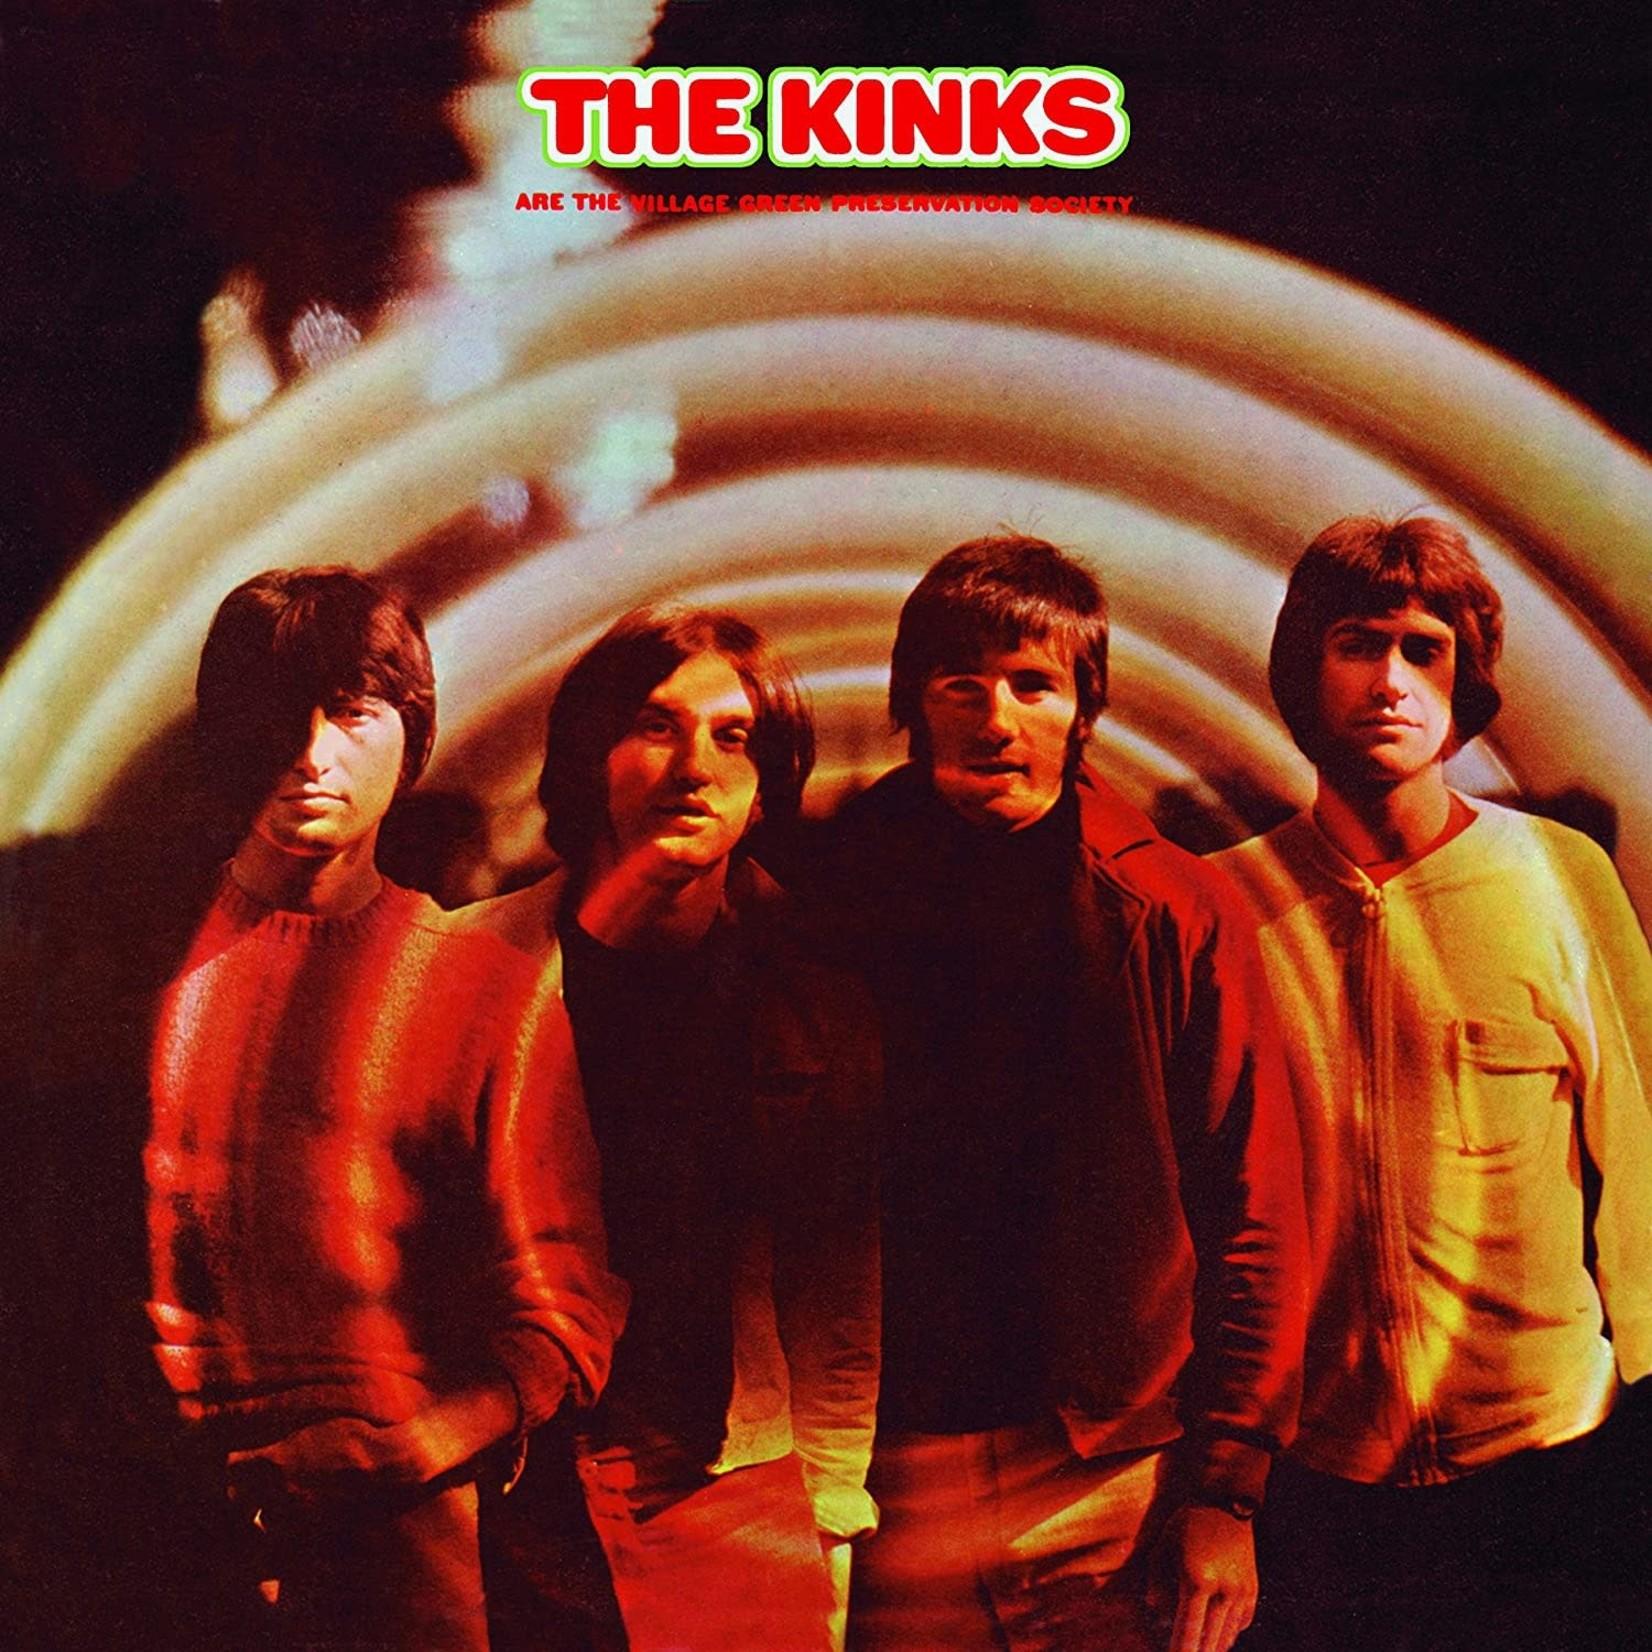 [New] Kinks: The Kinks Are The Village Green Preservation Society (mono, gatefold)